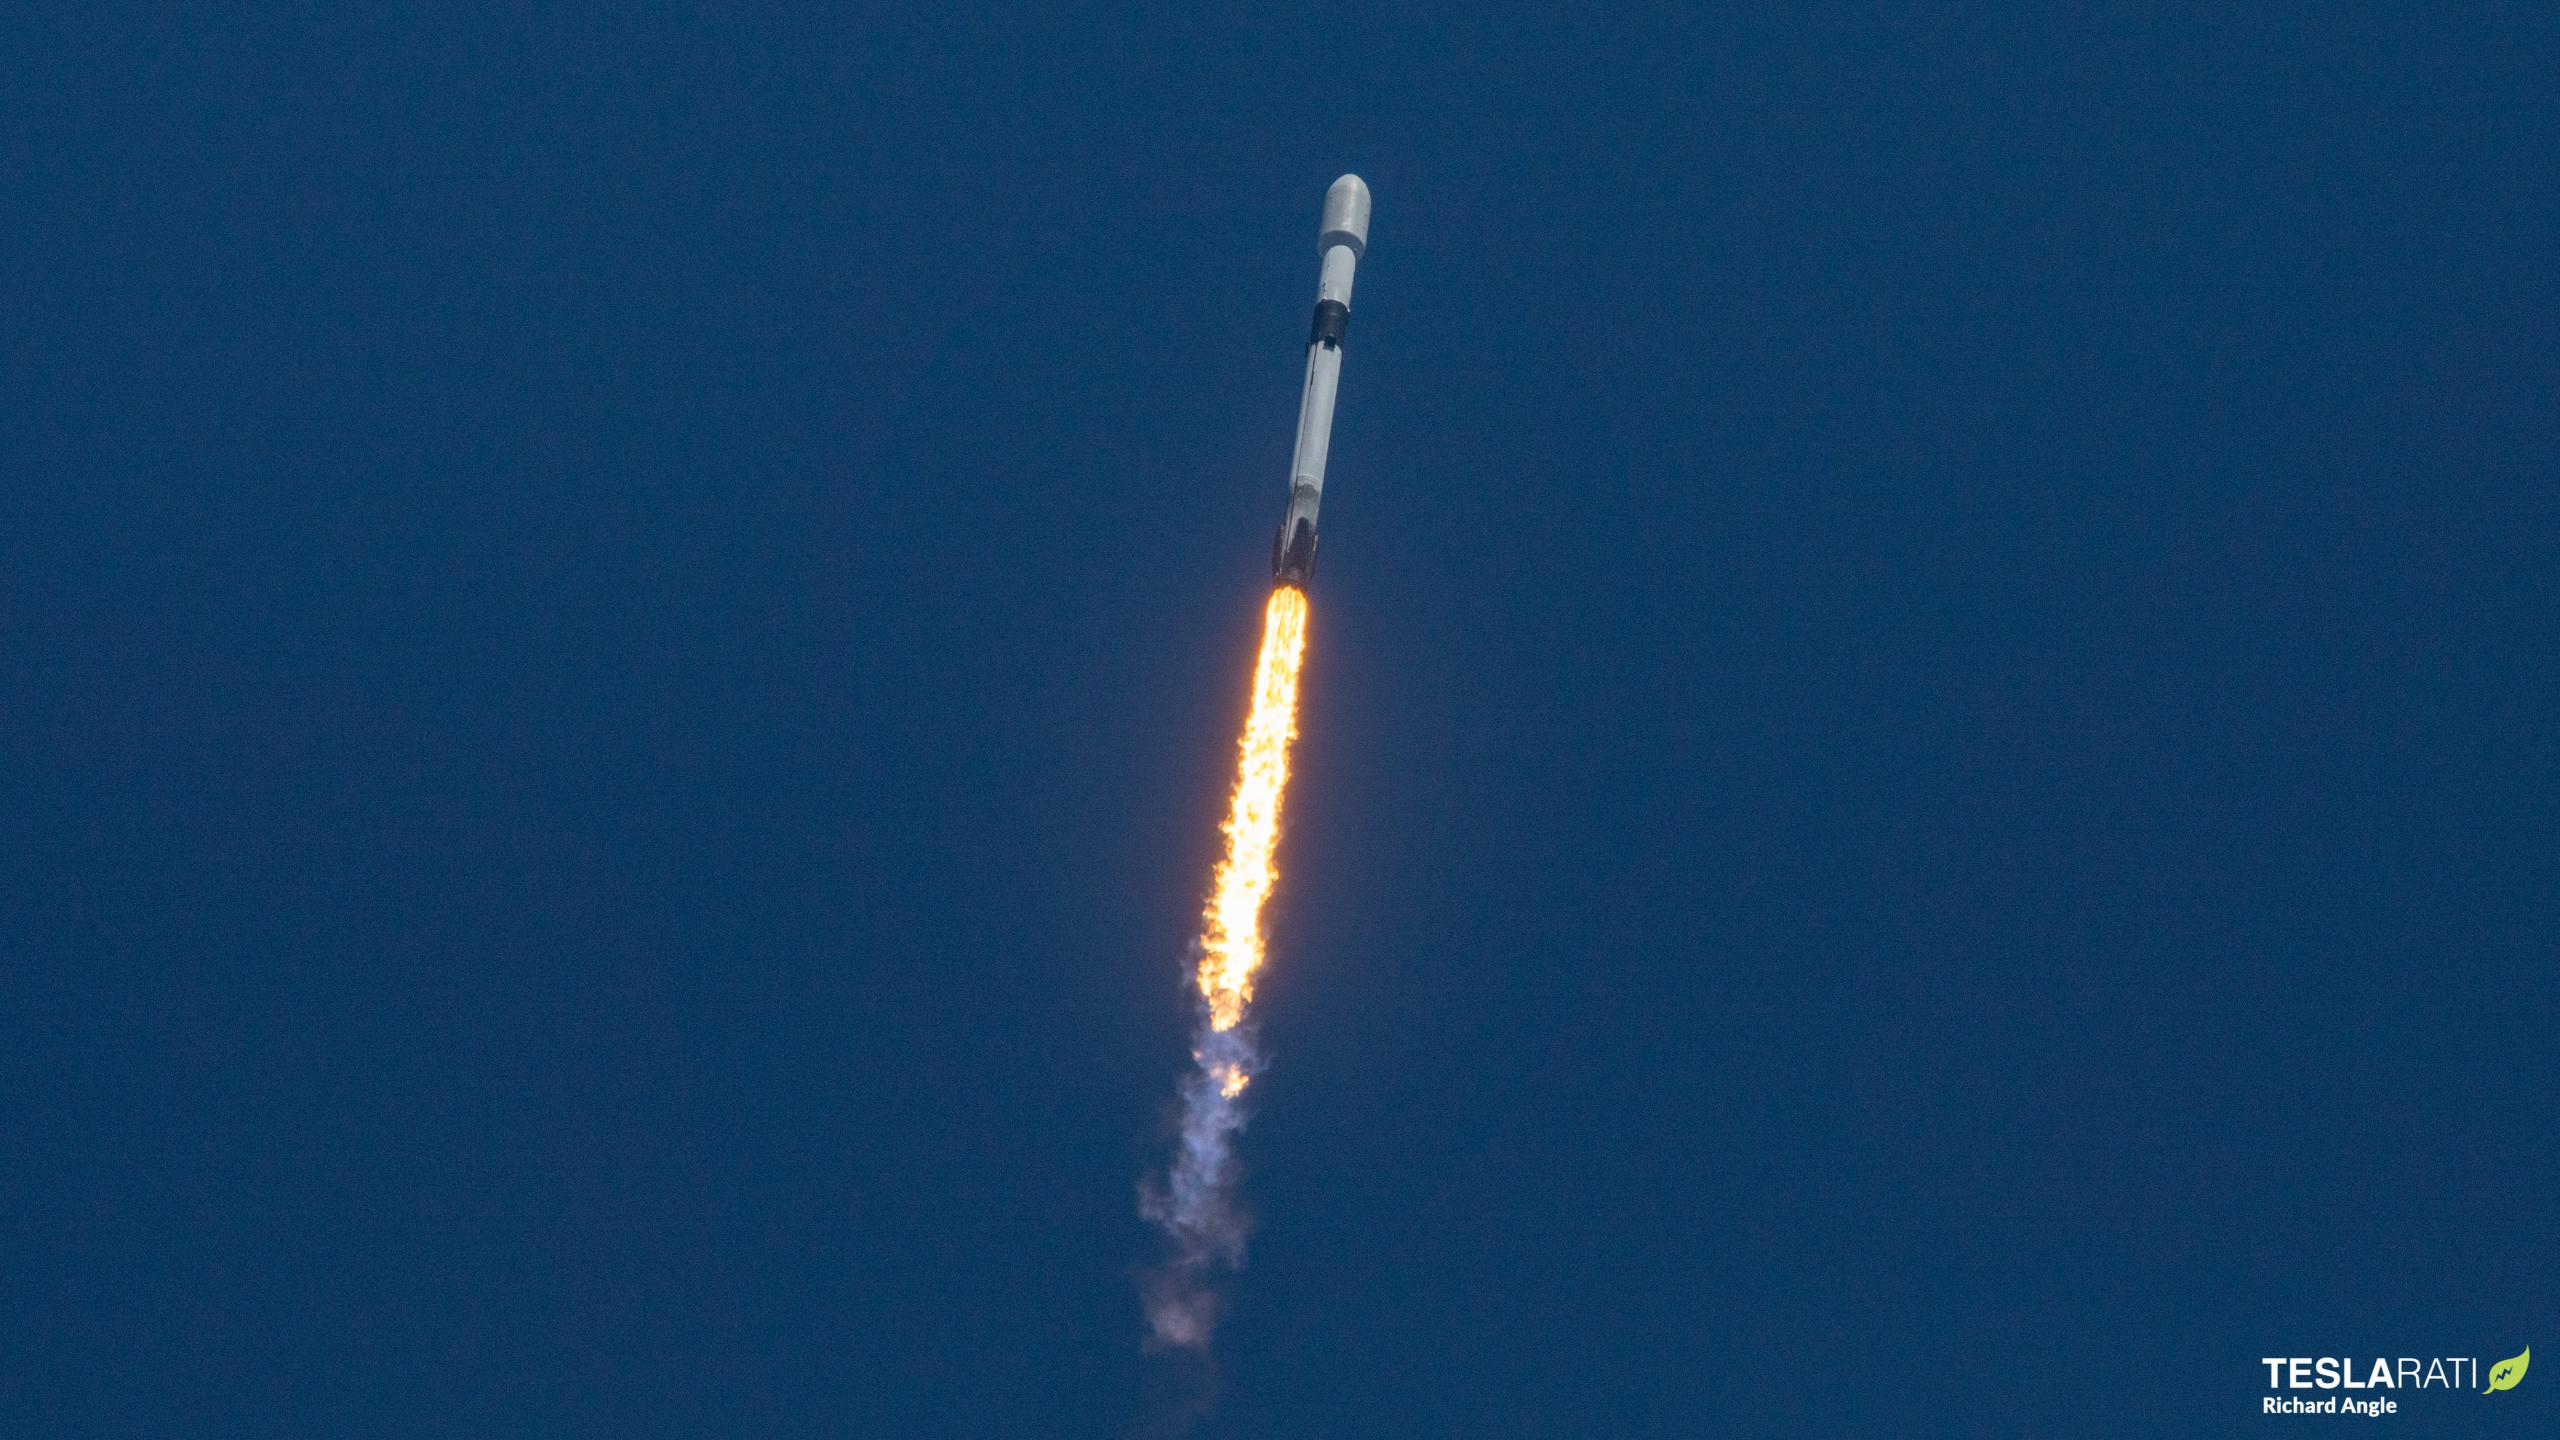 Starlink-23 Falcon 9 B1058 LC-40 040721 (Richard Angle) launch 2 (c)